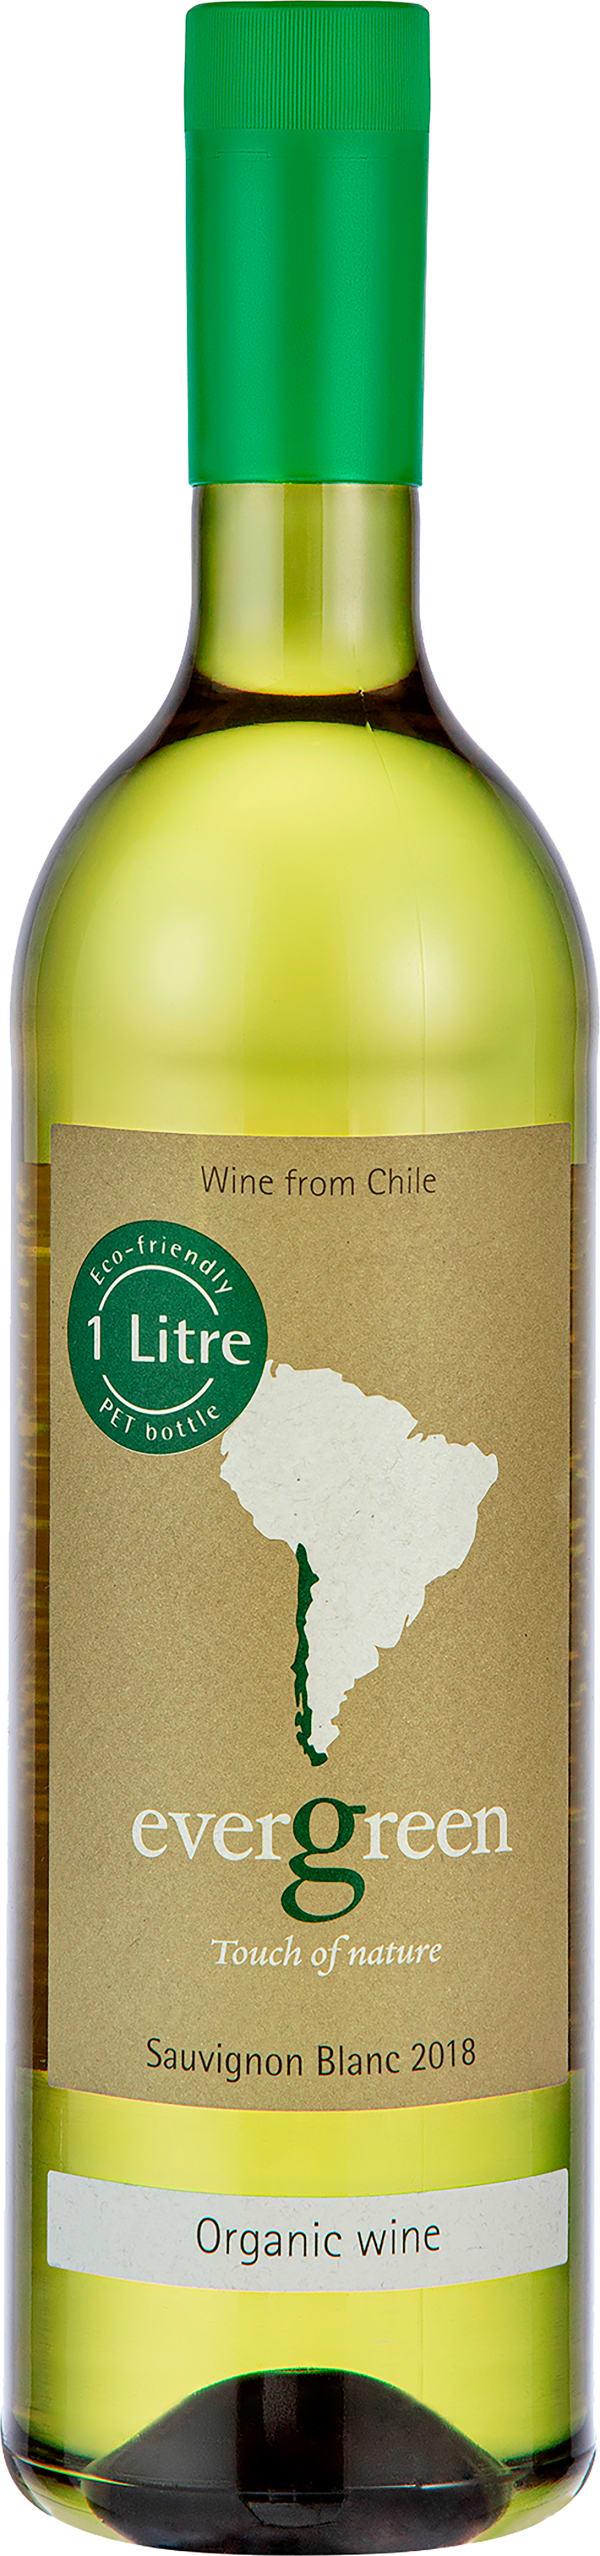 Evergreen Sauvignon Blanc 2016 plastic bottle